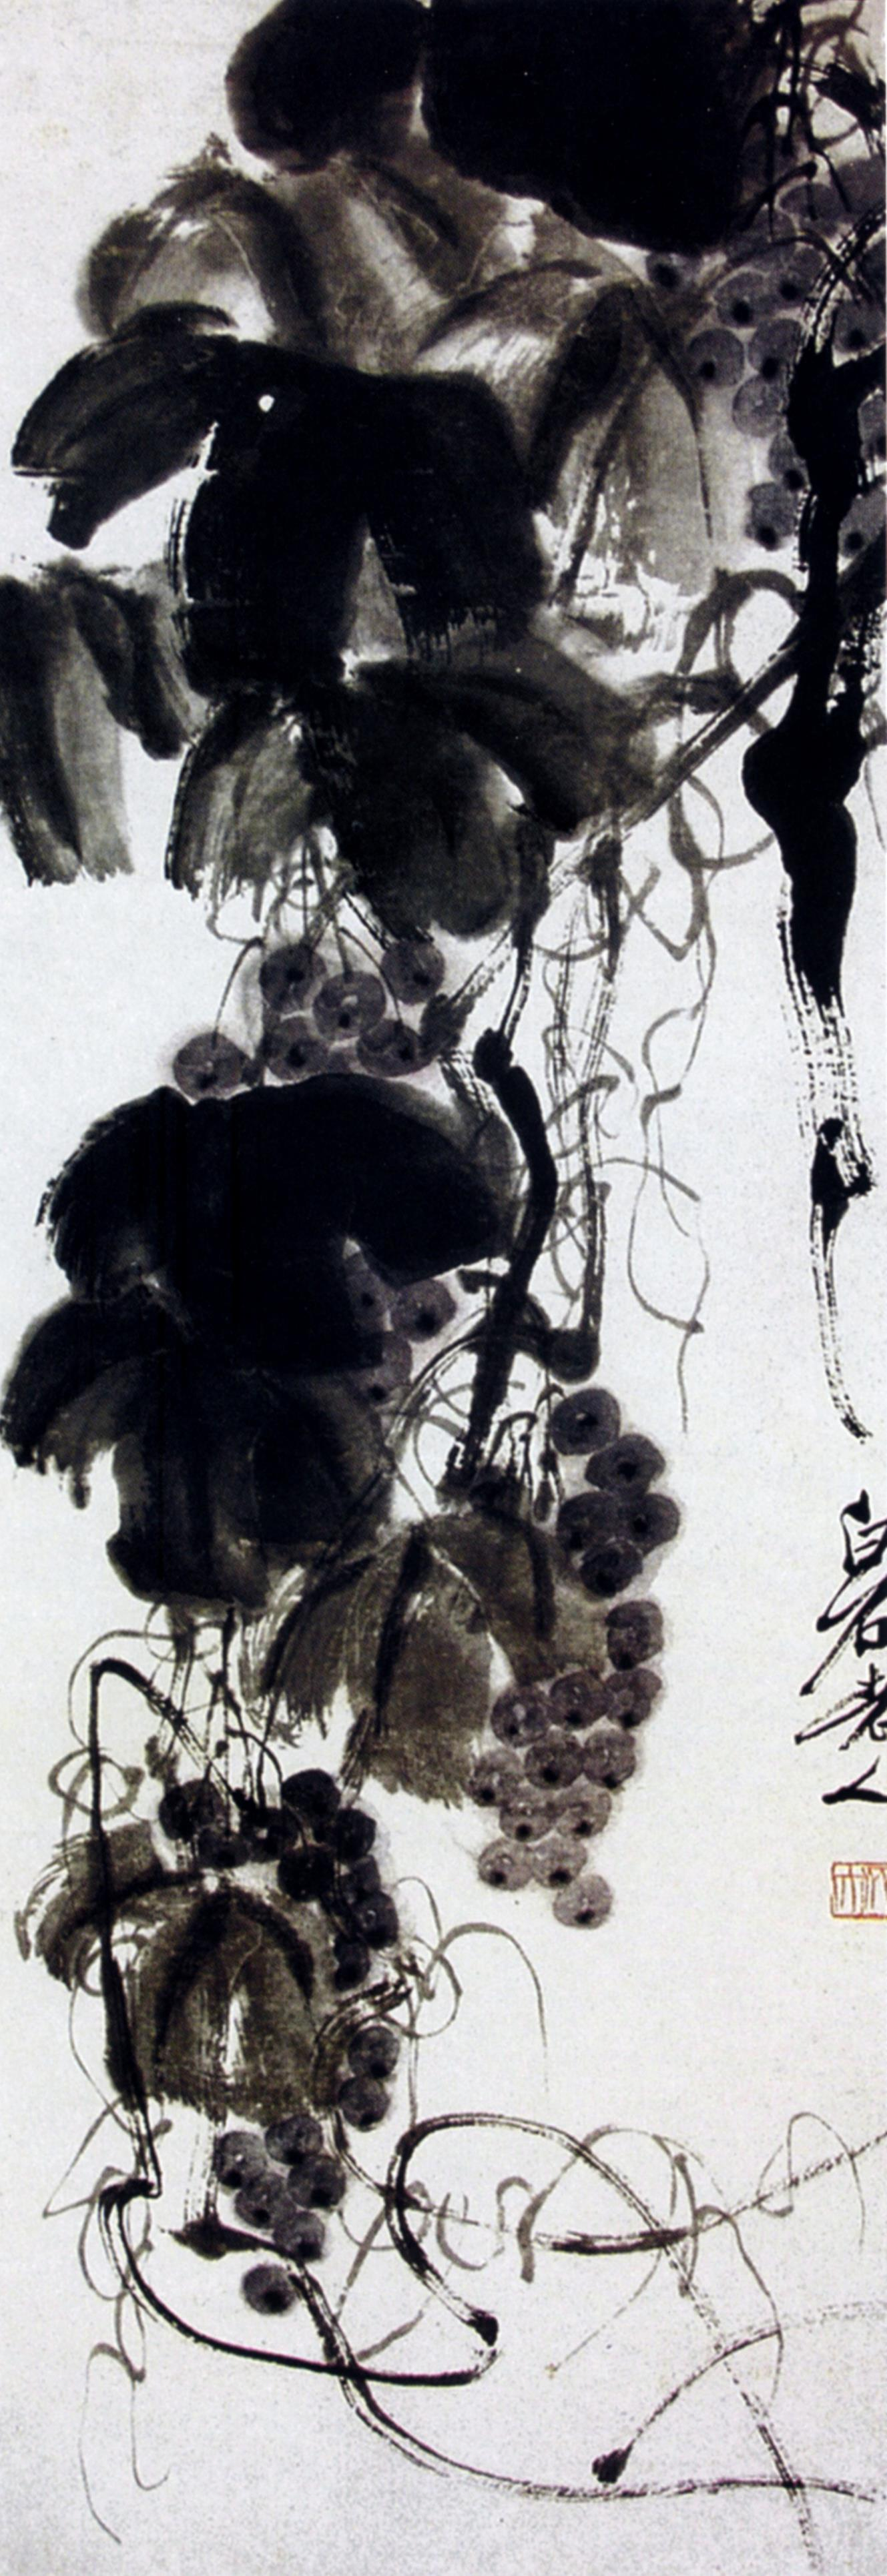 Картины Ци Бай-ши. Посвящается всем ...: nevsepic.com.ua/art-i-risovanaya-grafika/page,1,17137-kartiny-ci...